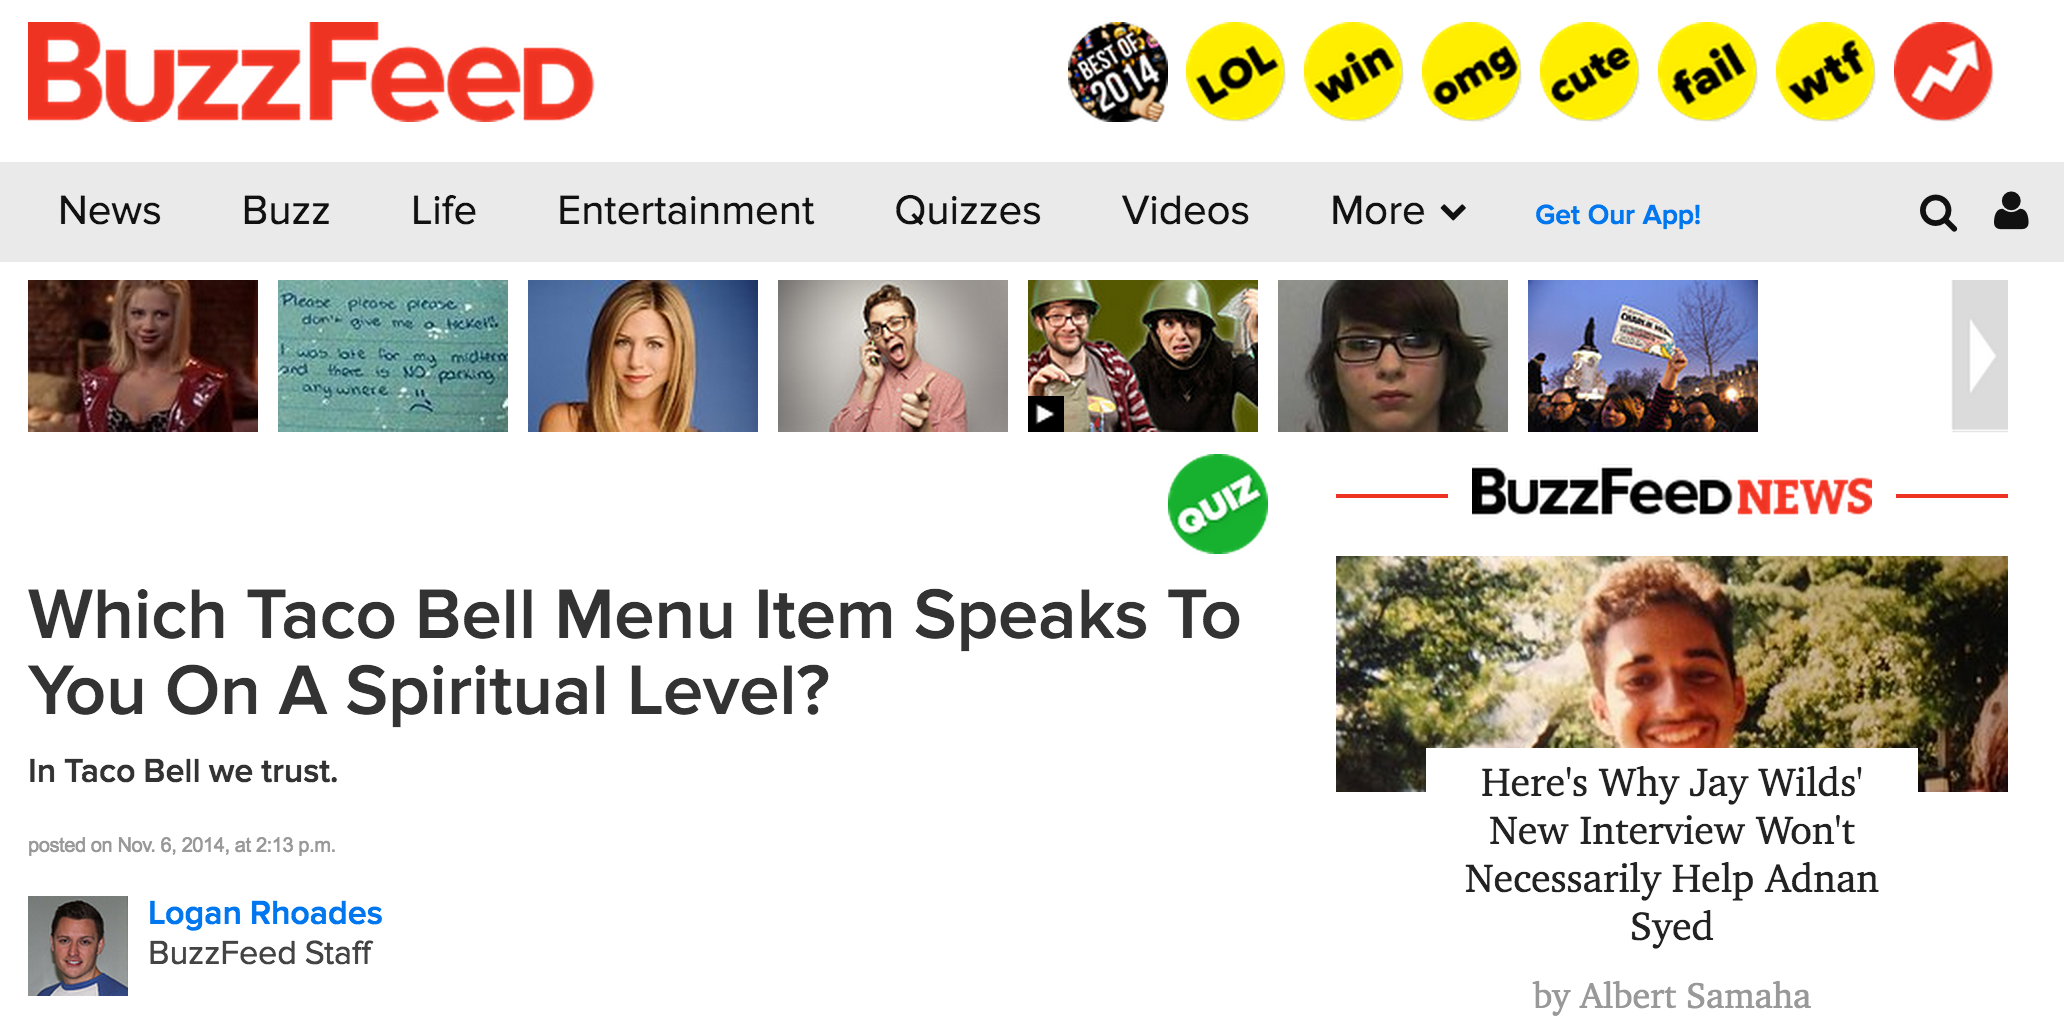 BuzzFeed-ClickbaitTitle